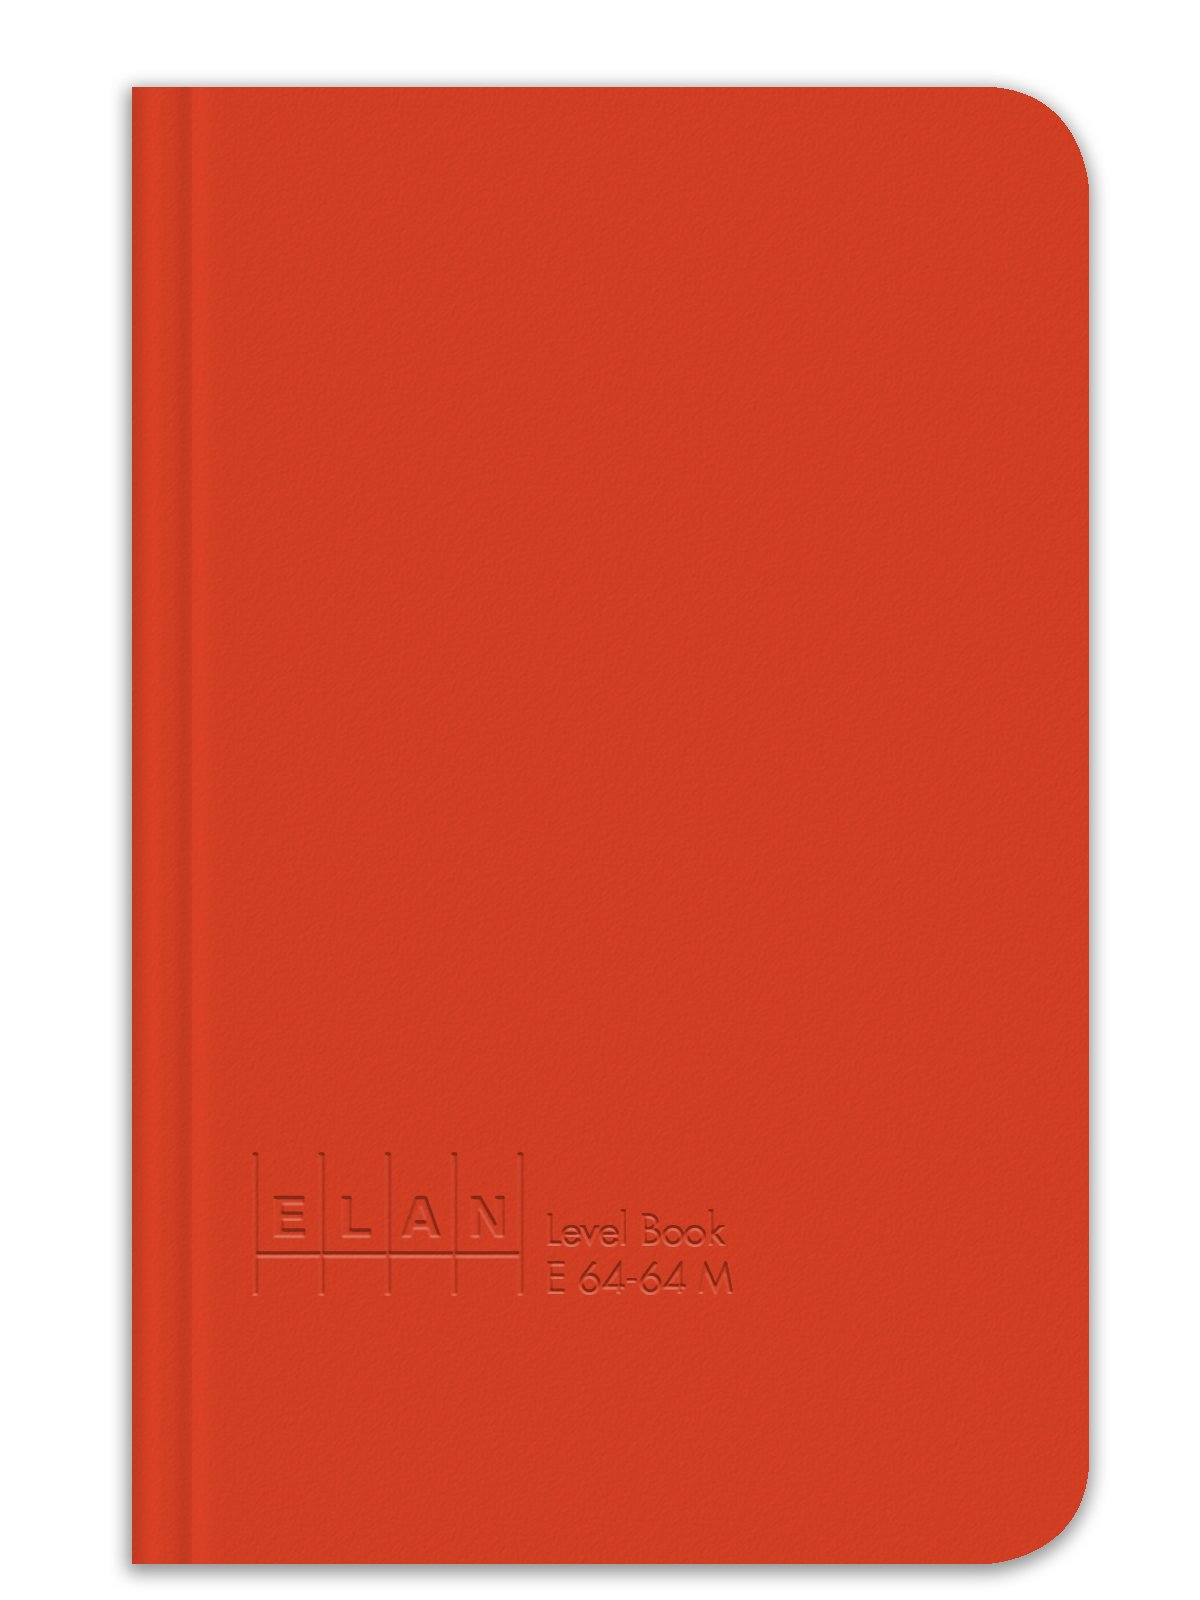 Elan Publishing Company E64-64M Mini Level Book 4 ⅛ x 6 ½, Bright Orange Cover (Pack of 24)